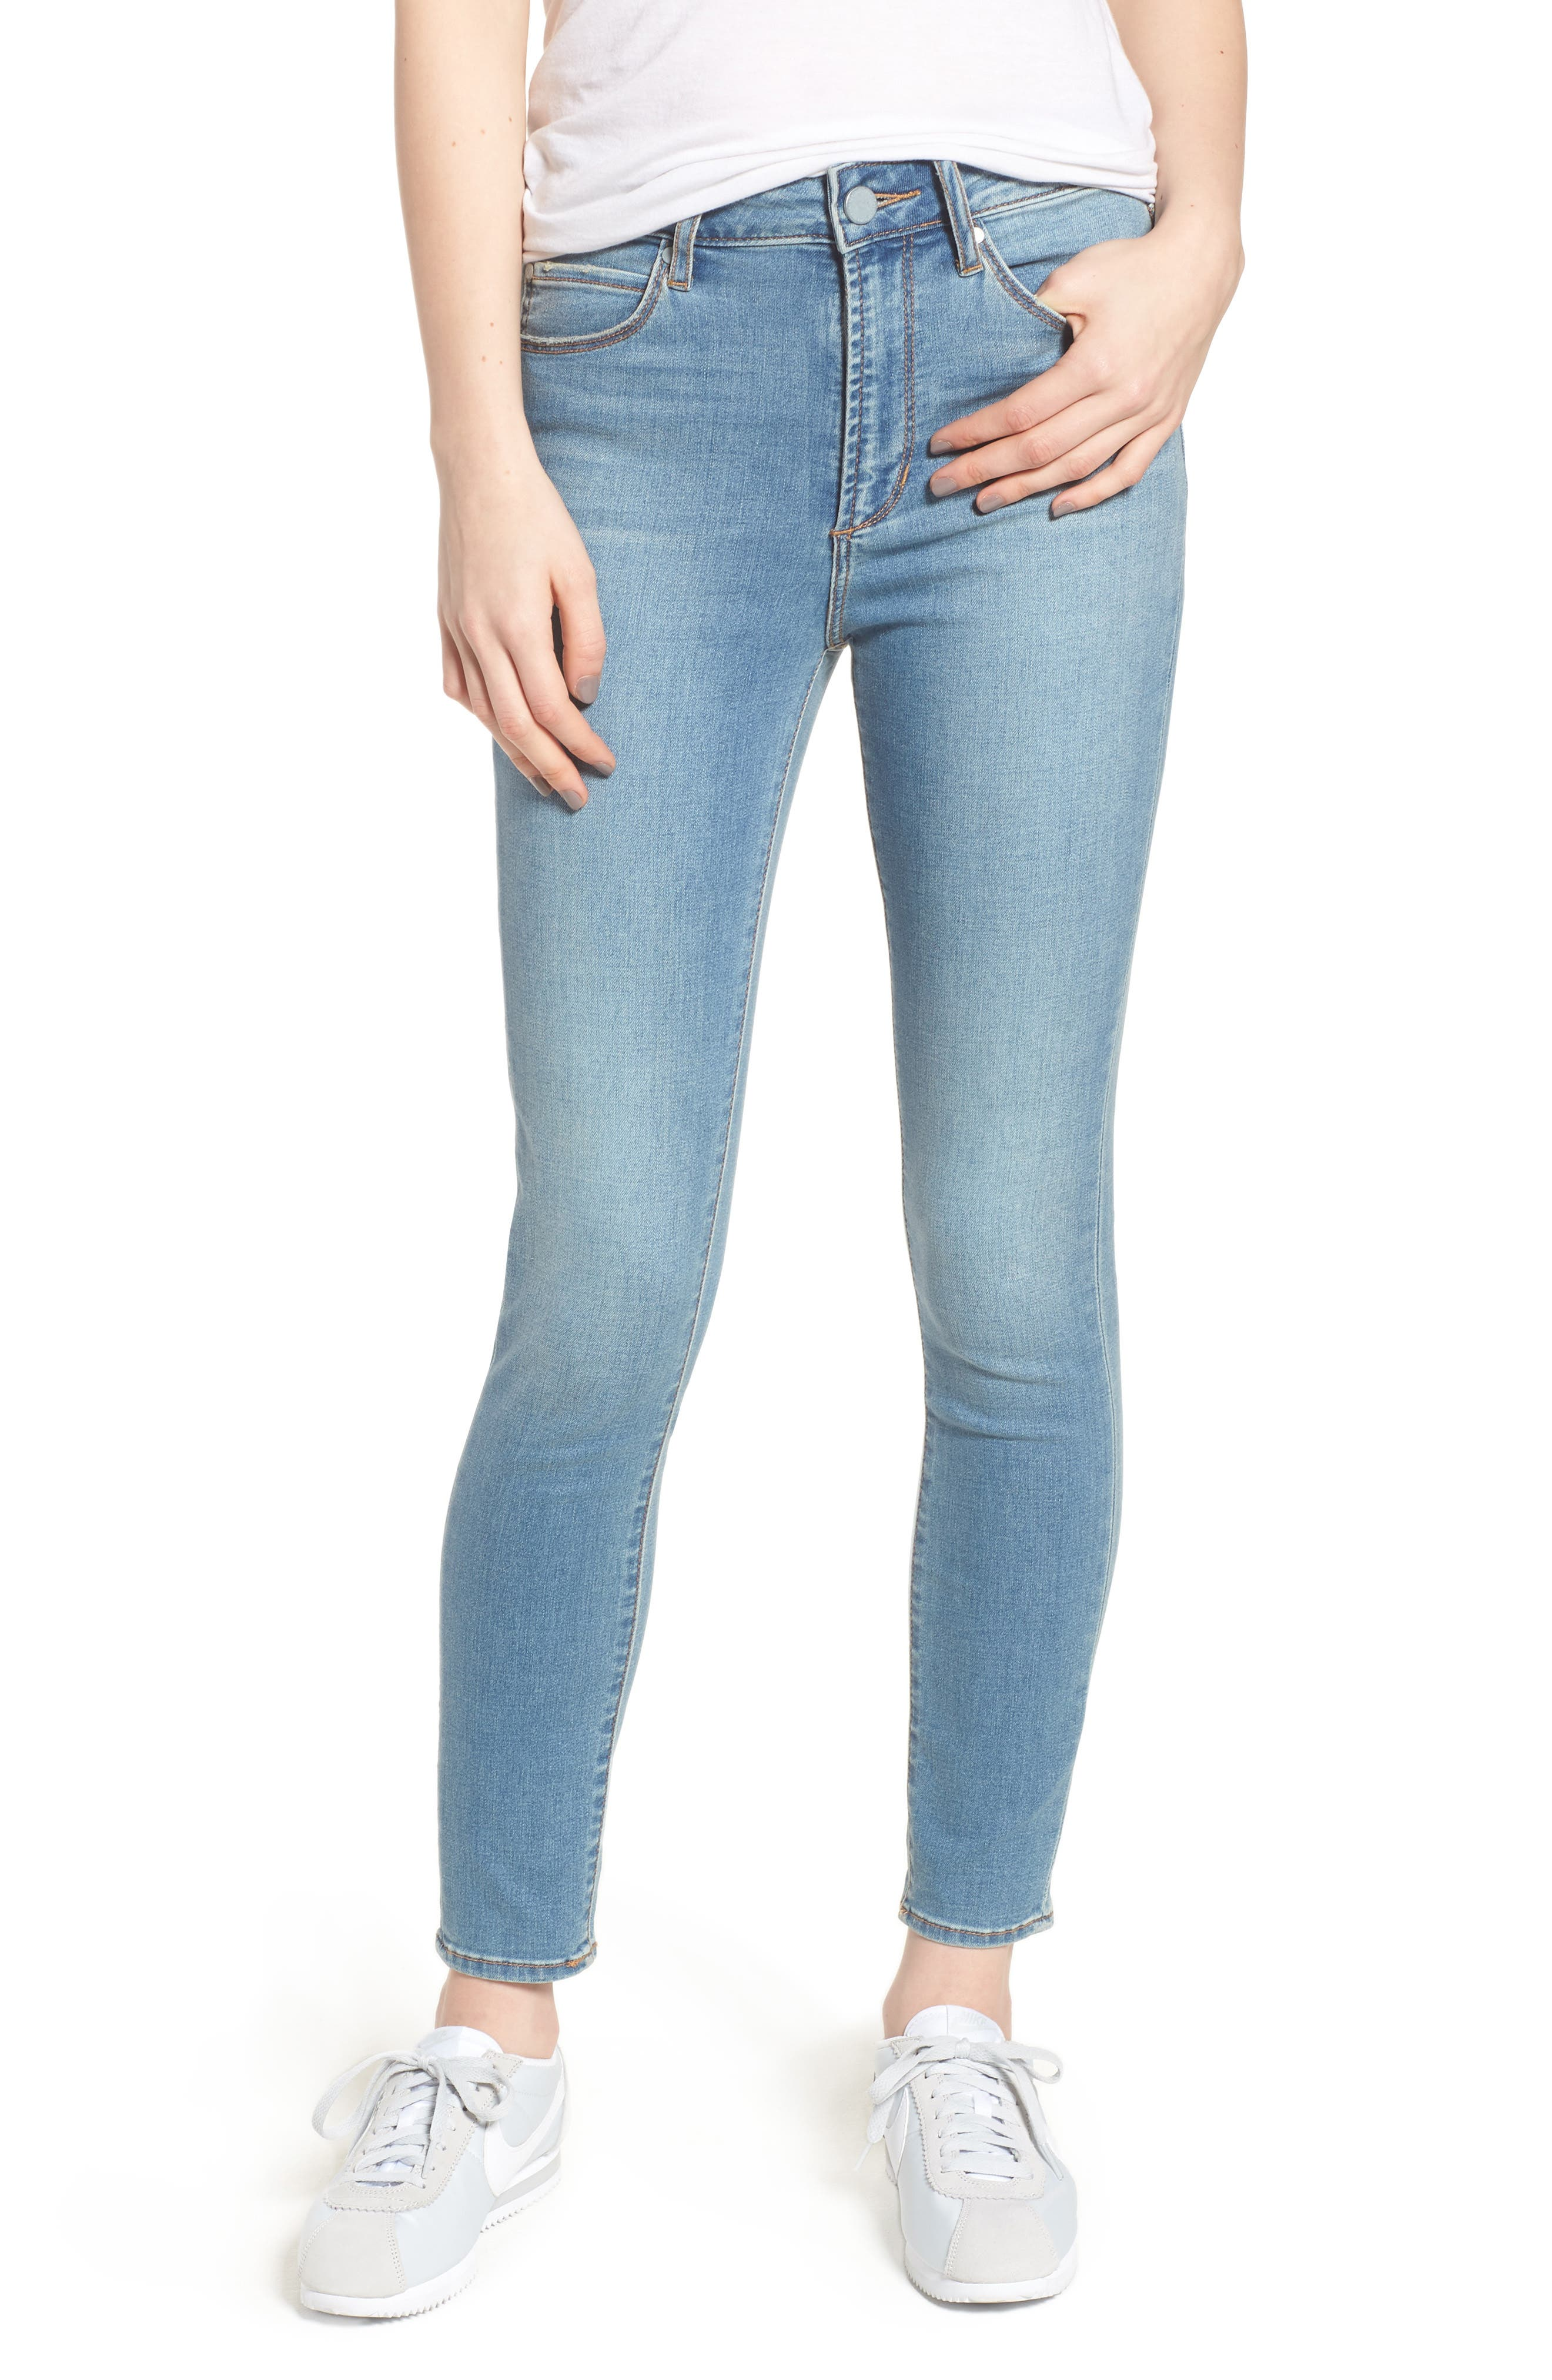 Articles of Society Heather High Waist Skinny Jeans (Monaco)